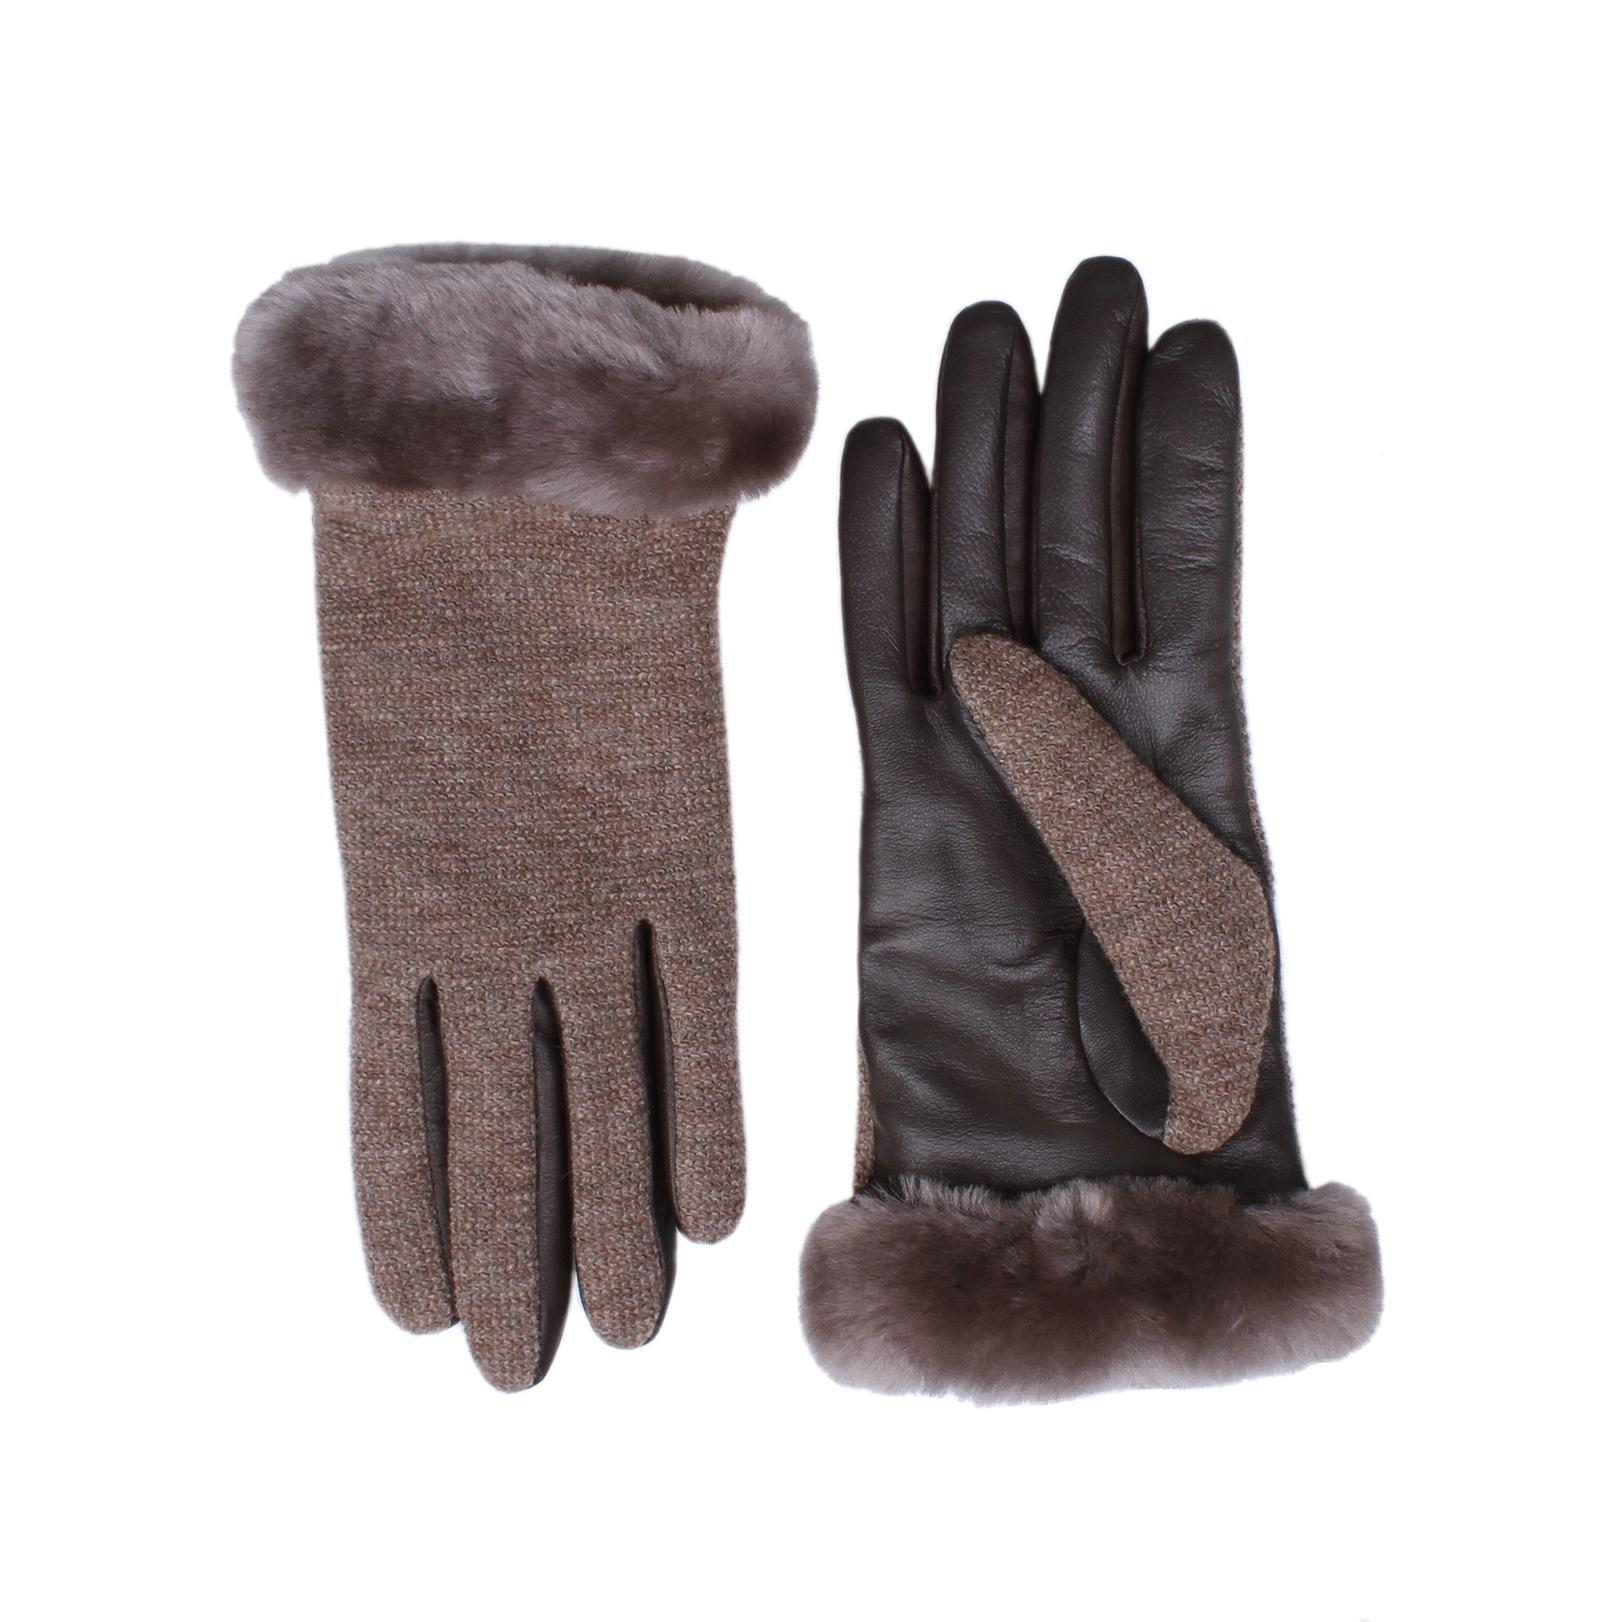 Ugg Shorty Smart Glove In Grey In Gray Lyst